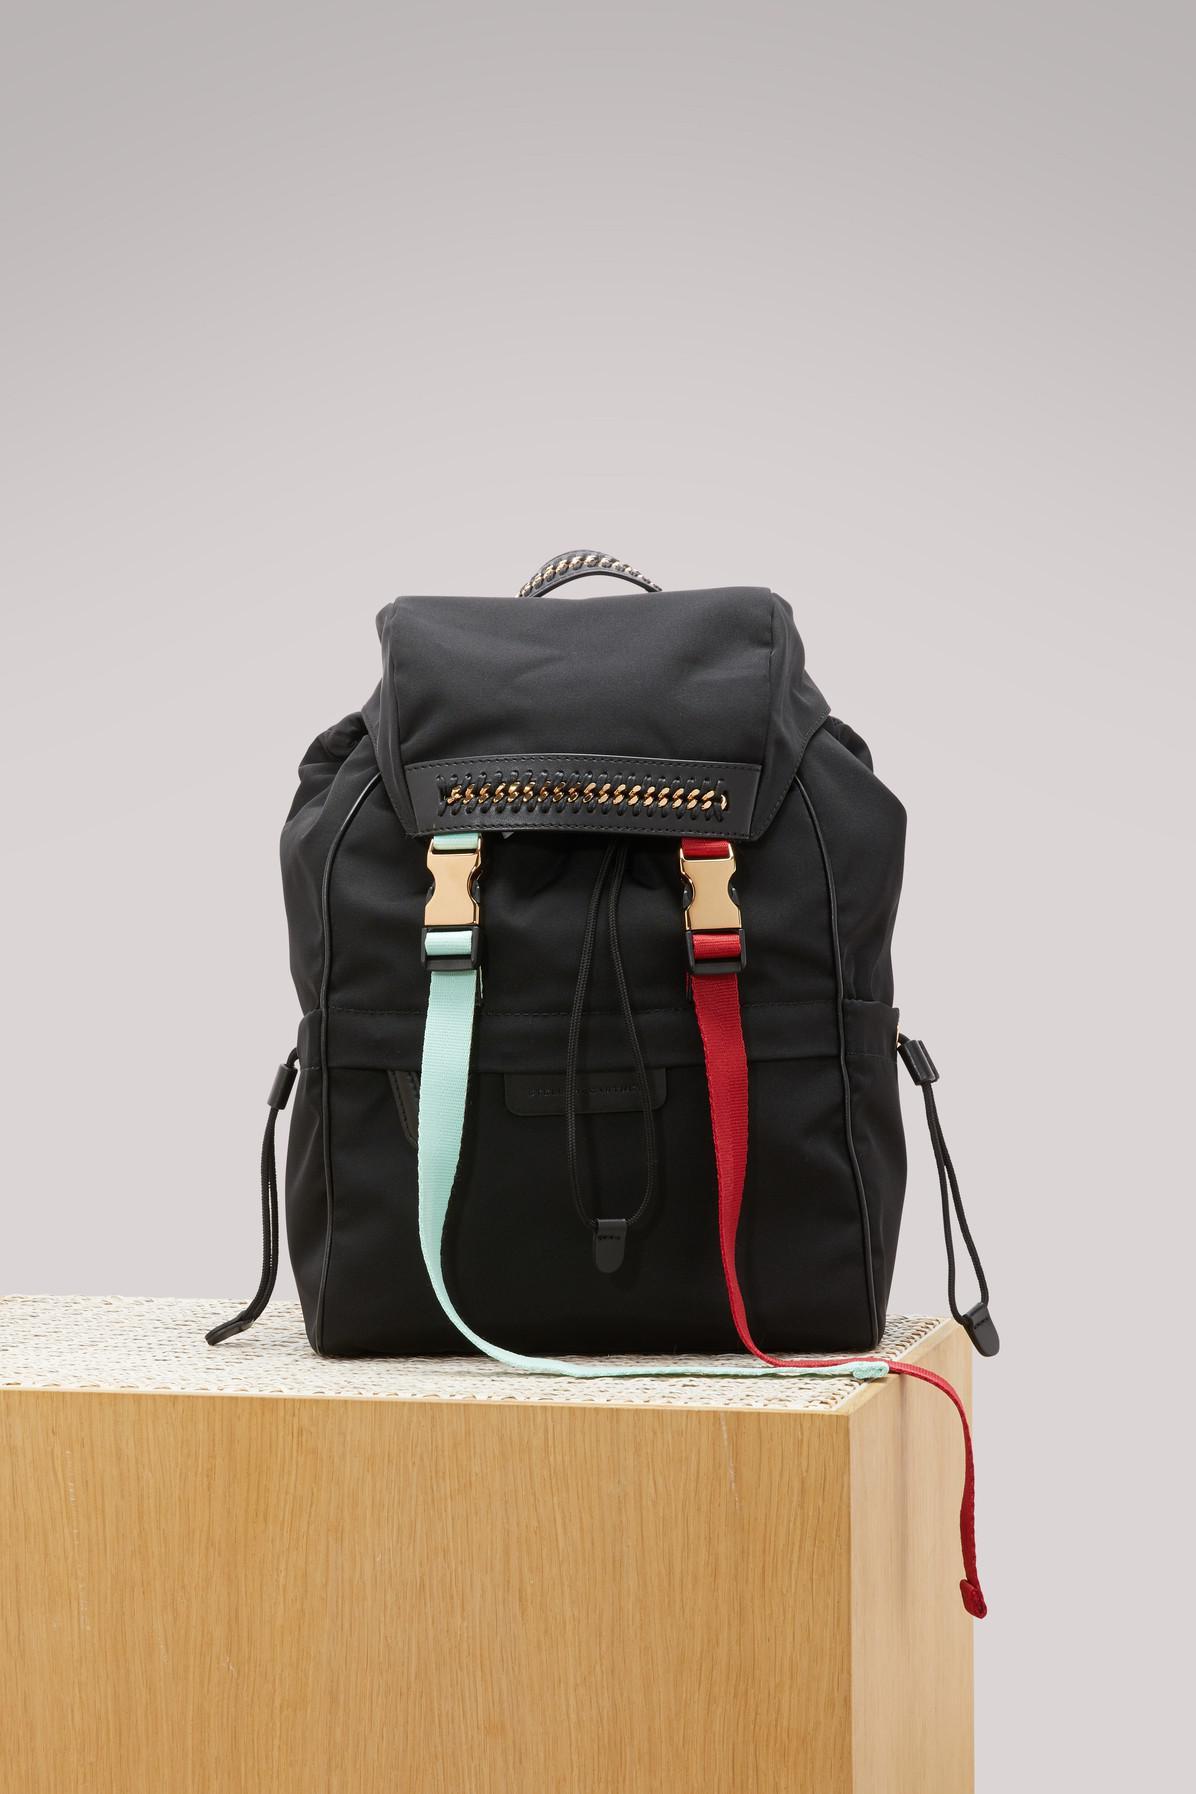 73e595756274 Stella Mccartney Falabella Go Backpack in Black - Lyst